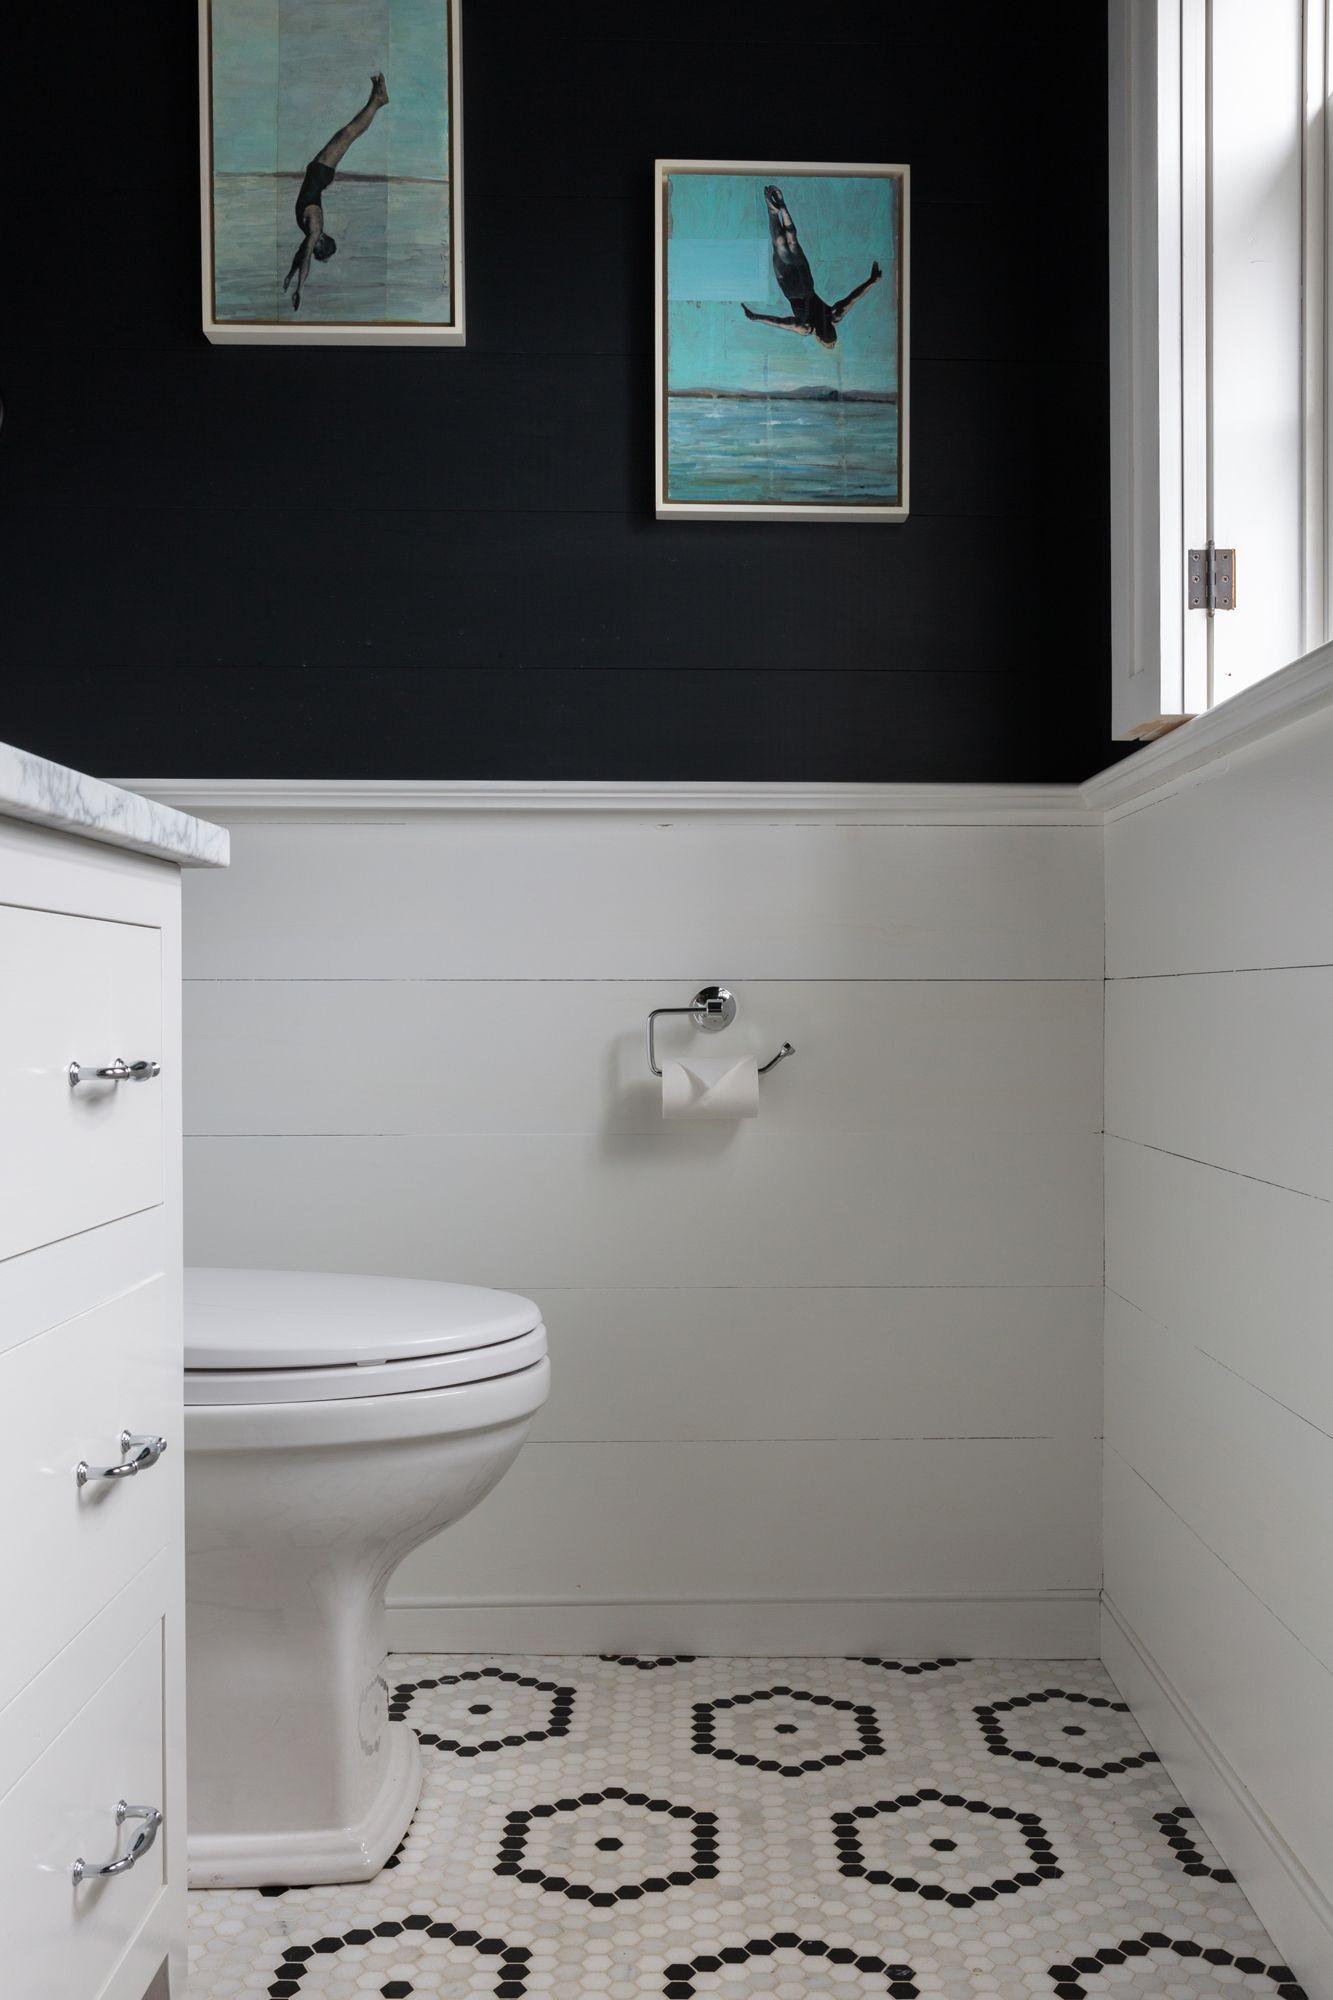 Mosaic Hexagon Floor Tile Penny Round Tile Floor Design Shiplap Halfway Up The Wall With Navy Pai Amazing Bathrooms Latest Bathroom Tiles Floor Tile Design